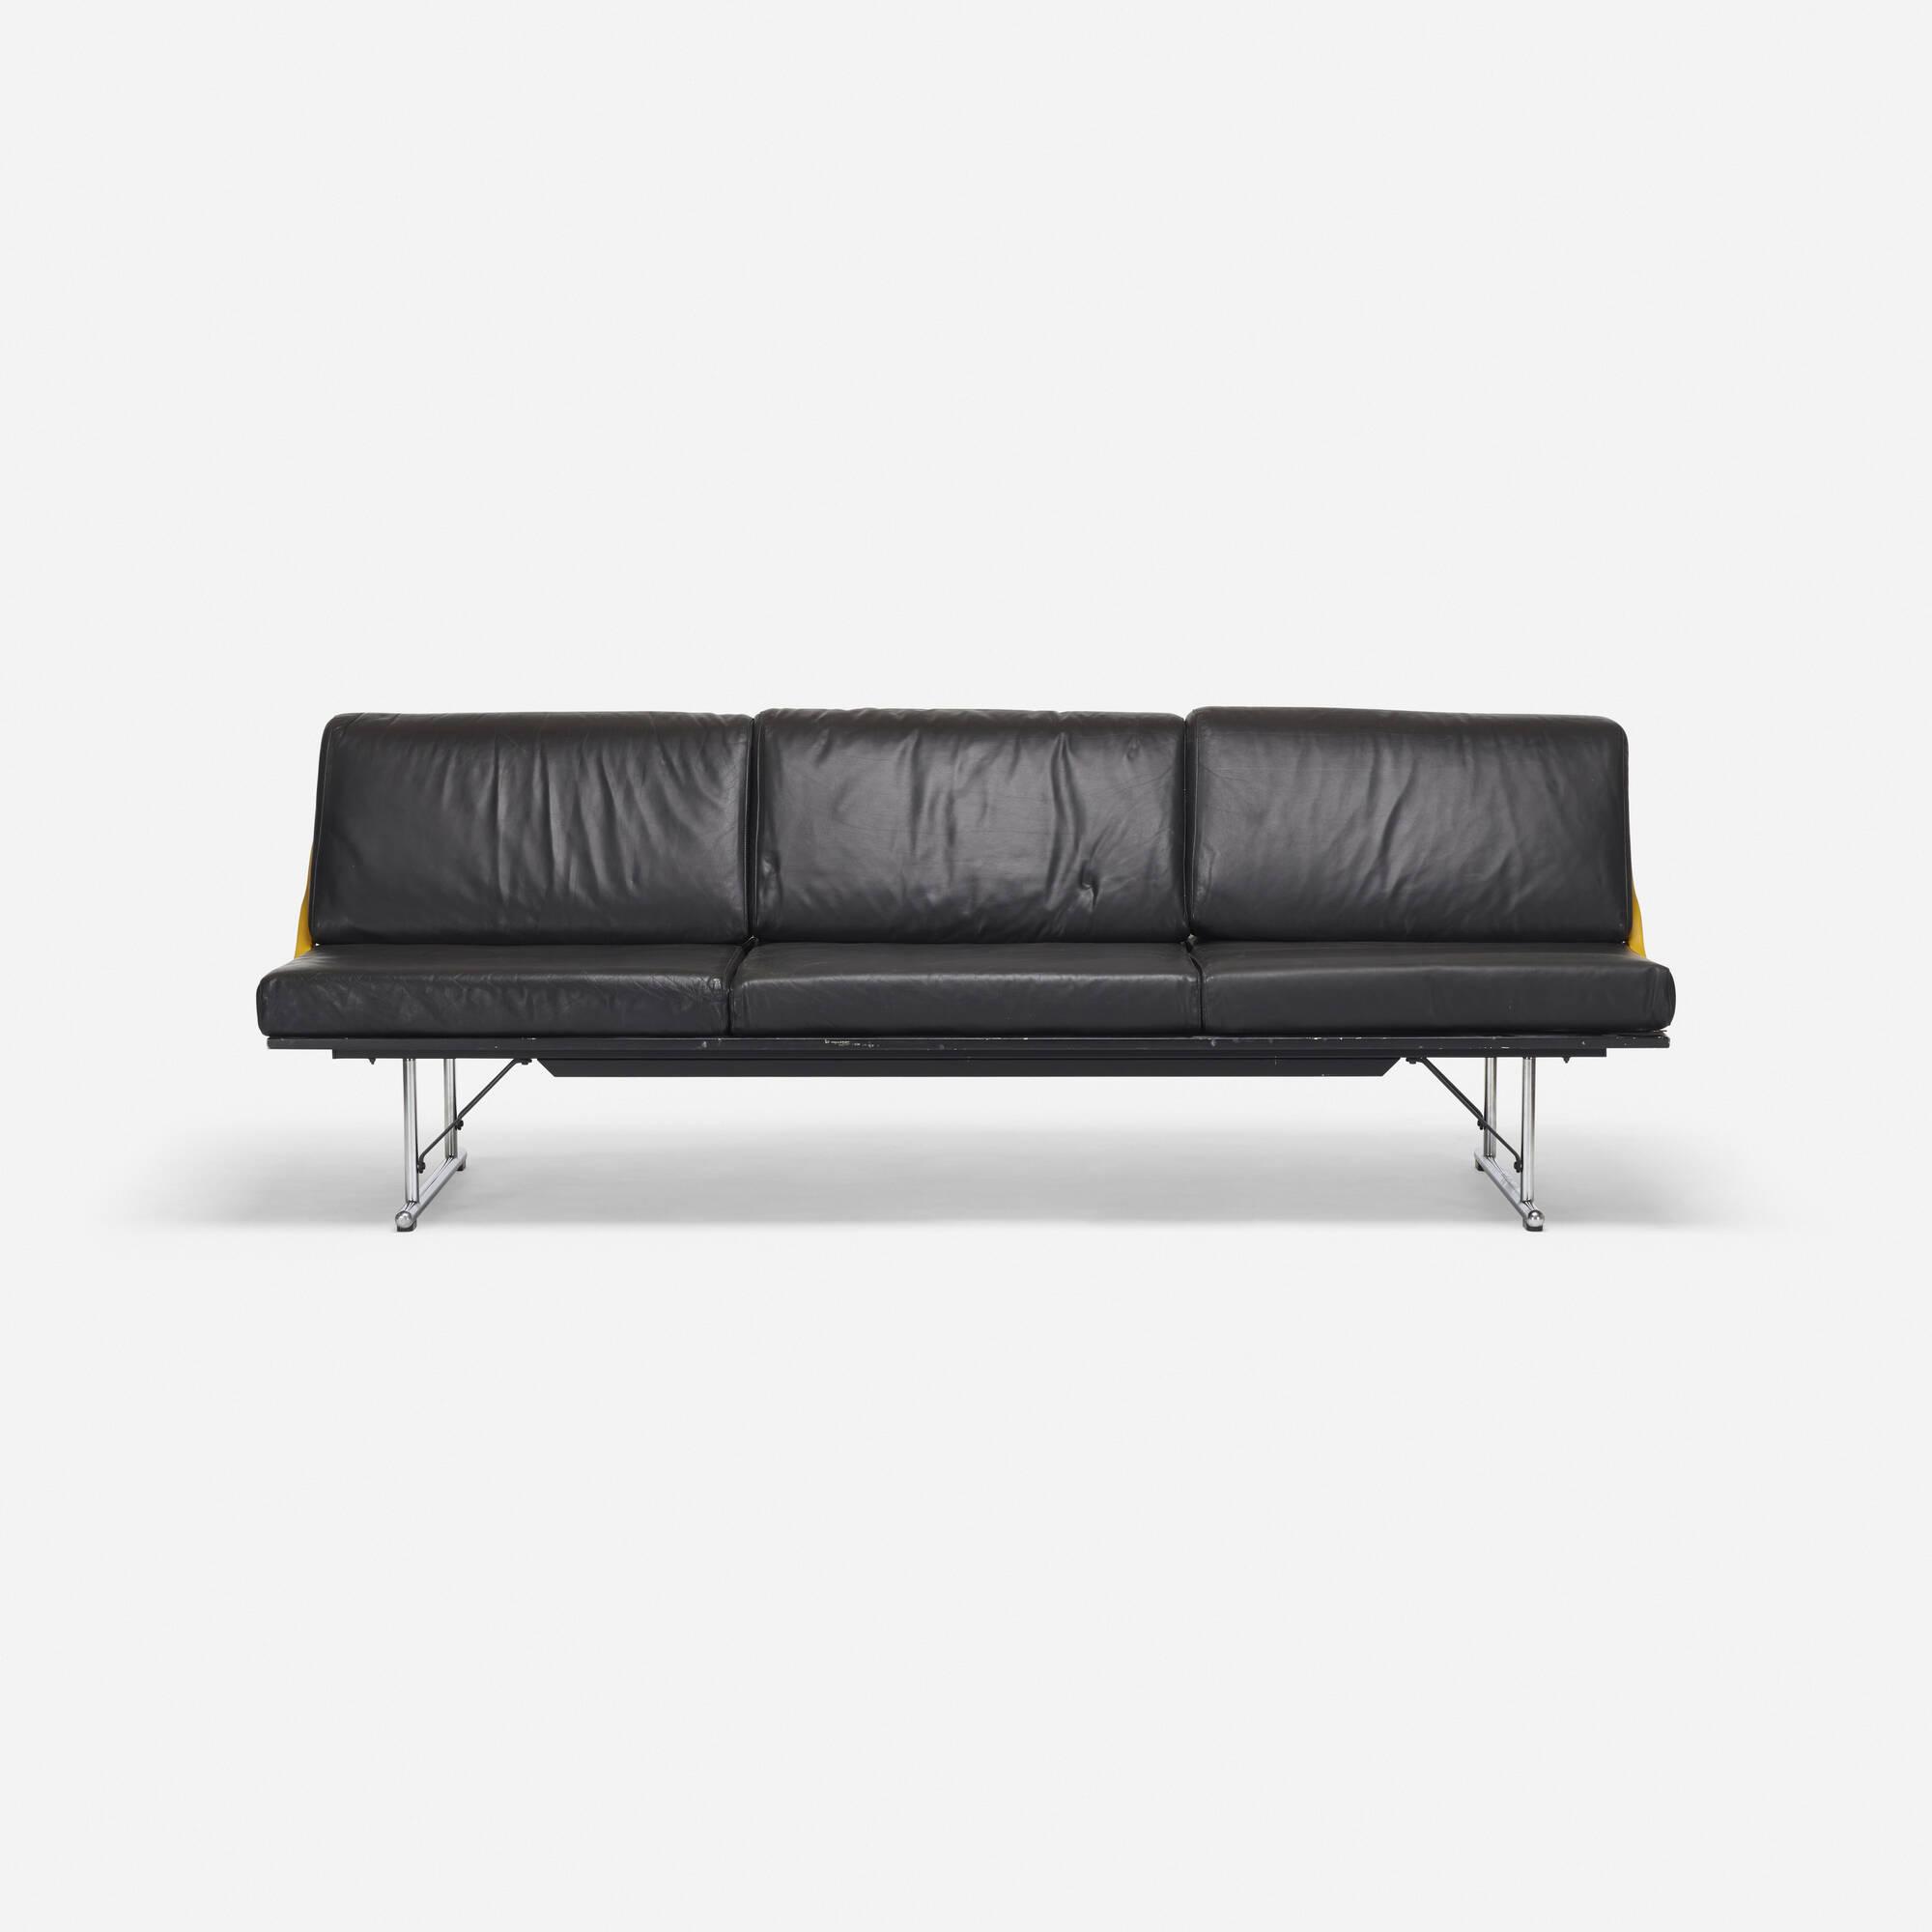 442: Yrjö Kukkapuro / Experiment sofa < Art + Design, 18 July 2017 ... | {Küchenmöbel 2017 46}